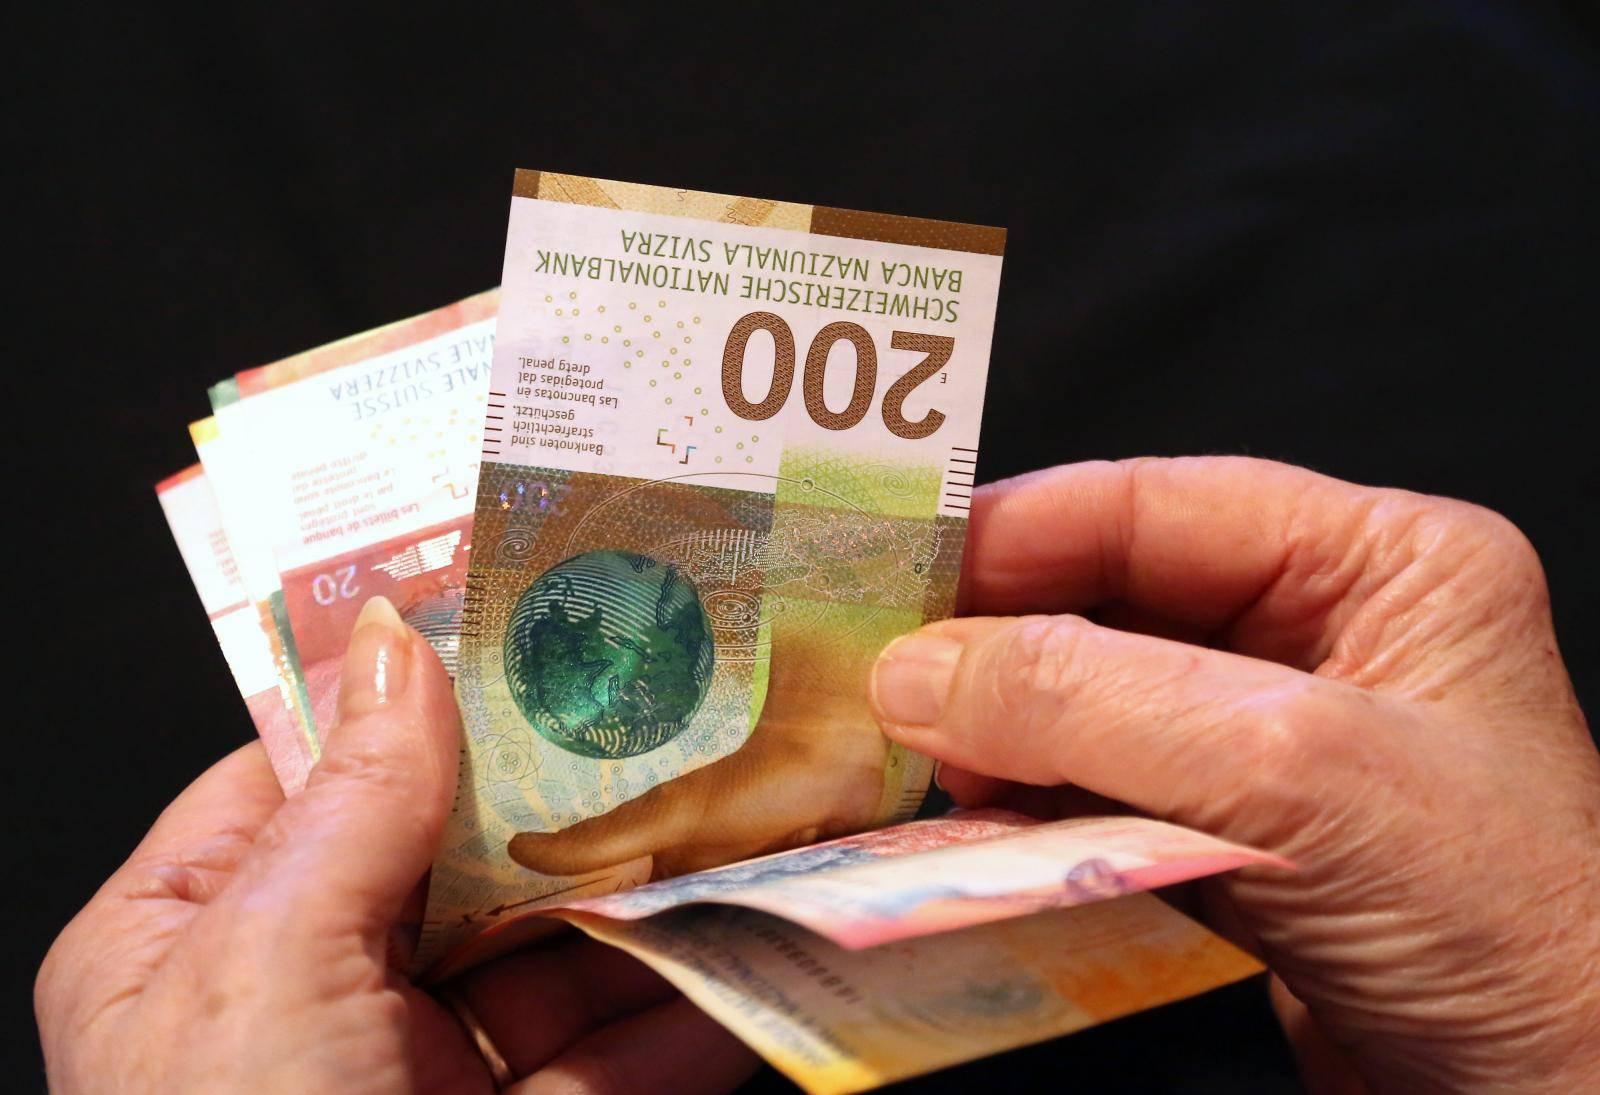 Tijekom 2018. godine Švicarska je pustila u opticaj nove papirnate novčanice švicarskog franka